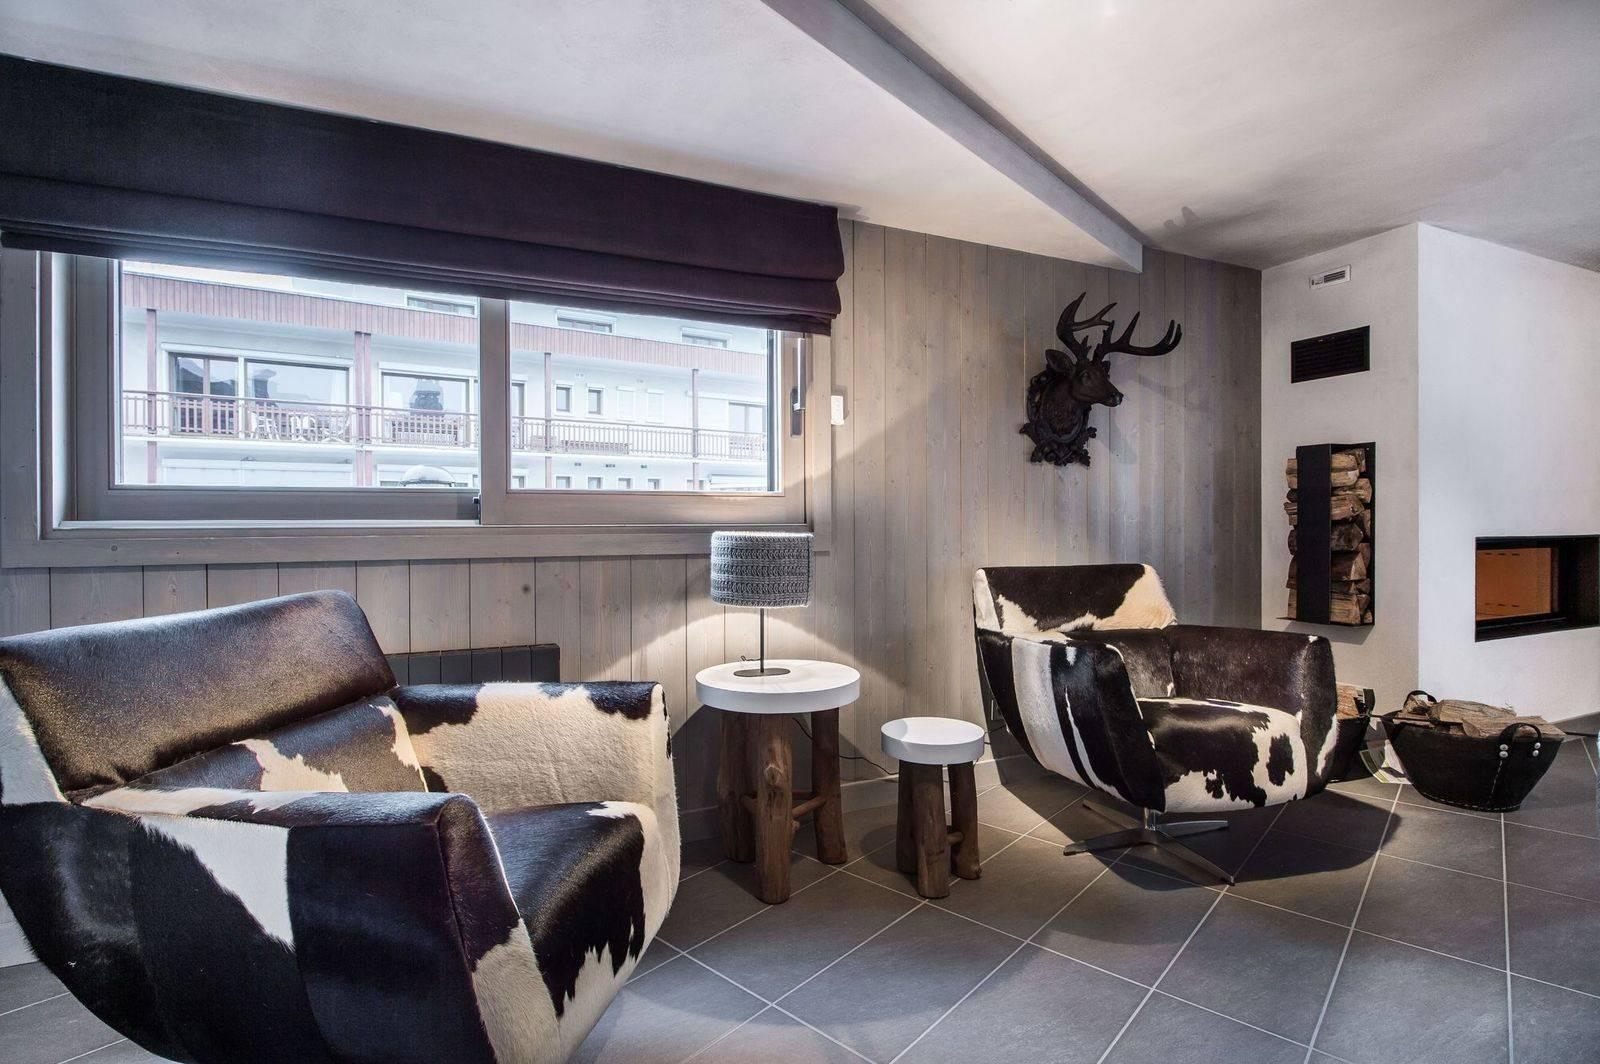 Courchevel 1650 Location Appartement Luxe Neustadelite Séjour 4